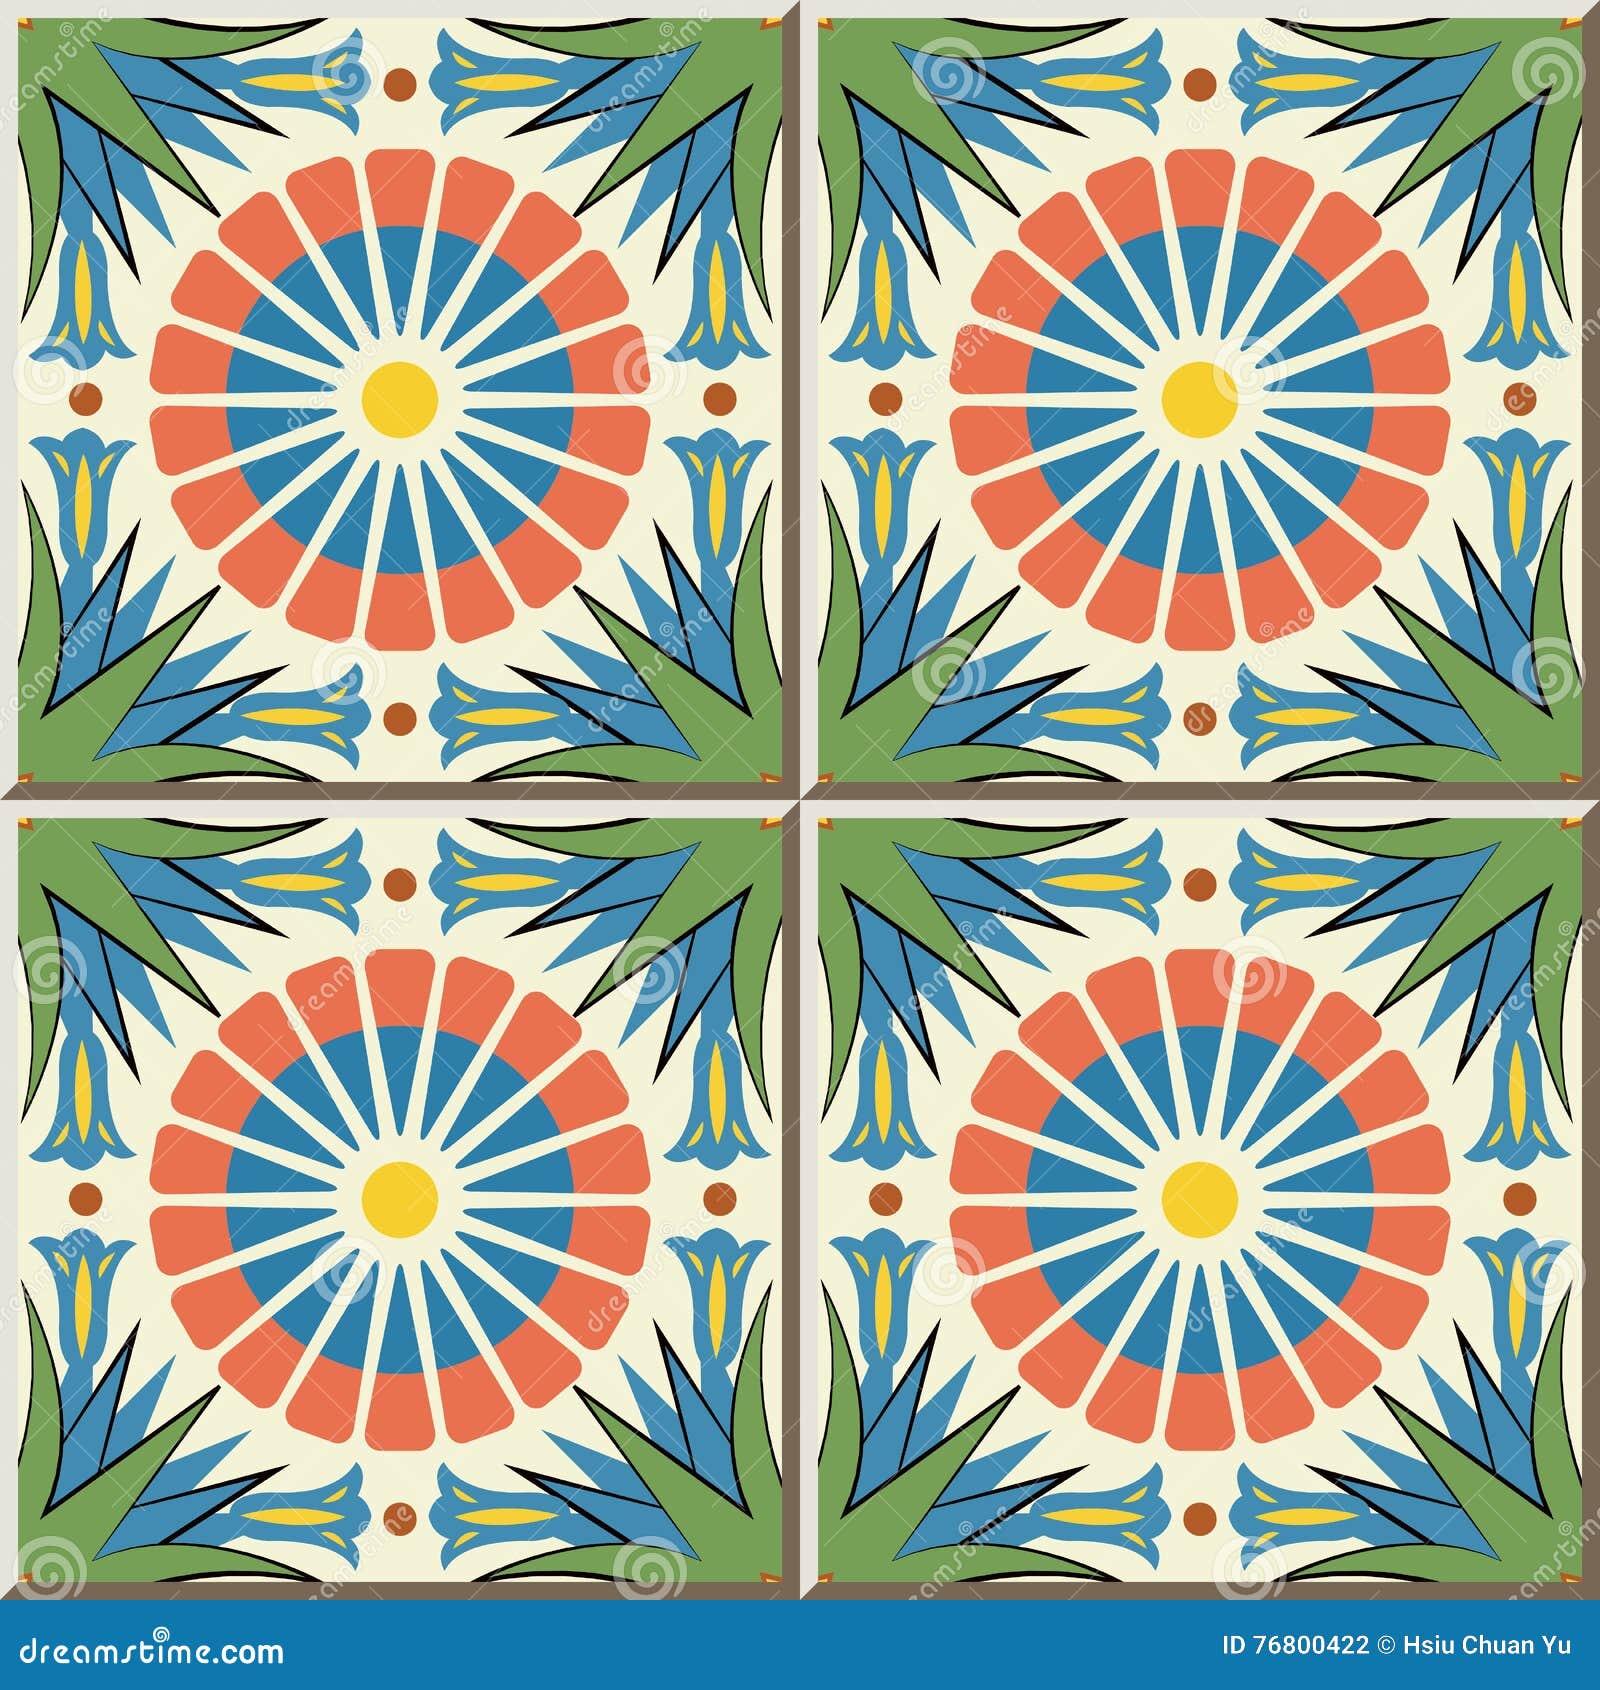 Ceramic Tile Pattern 432 Round Flower Point Leaf Cross Stock Vector ...